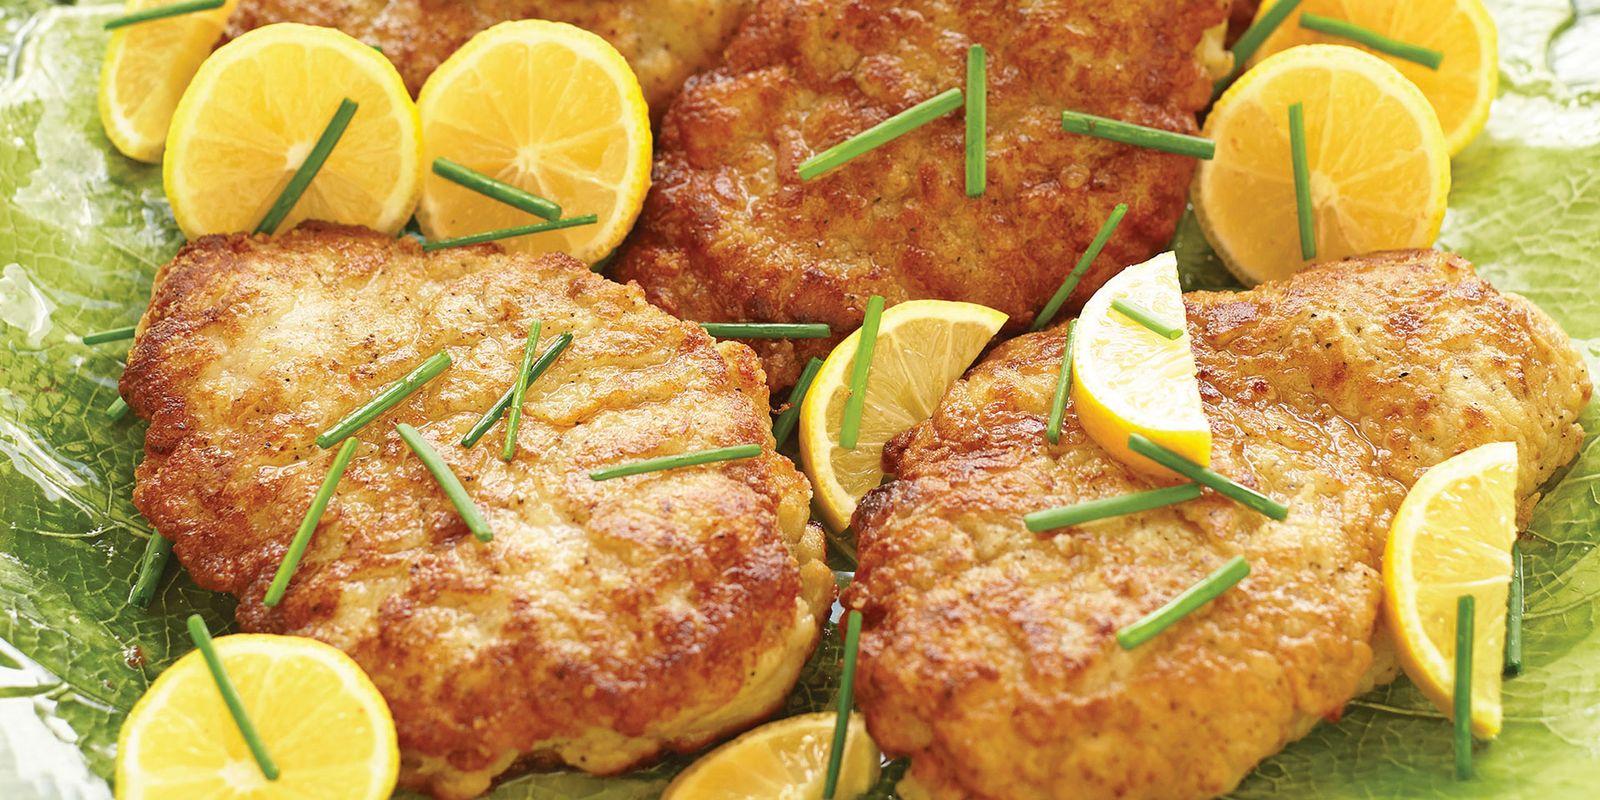 Parmesan Crusted Chicken parmesan crusted chicken recipe from alex hitz